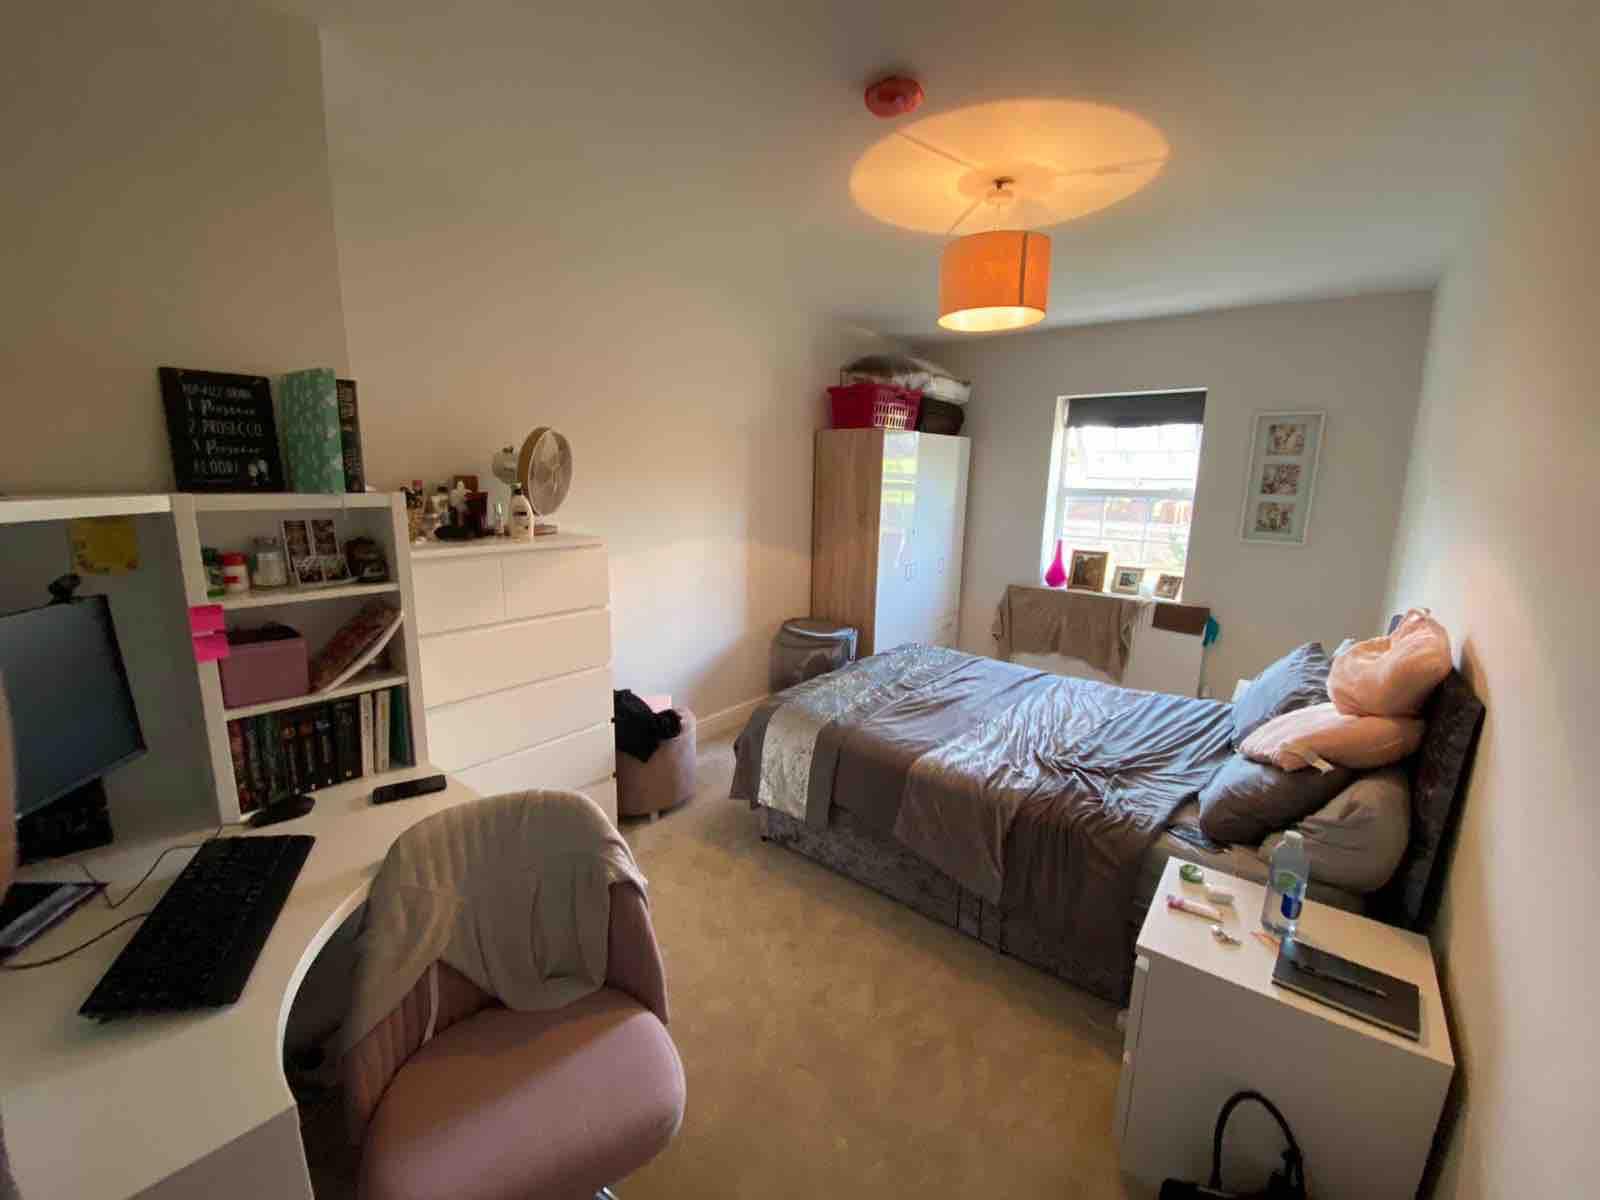 3 rooms in Ruislip, London, HA4 7DA RoomsLocal image